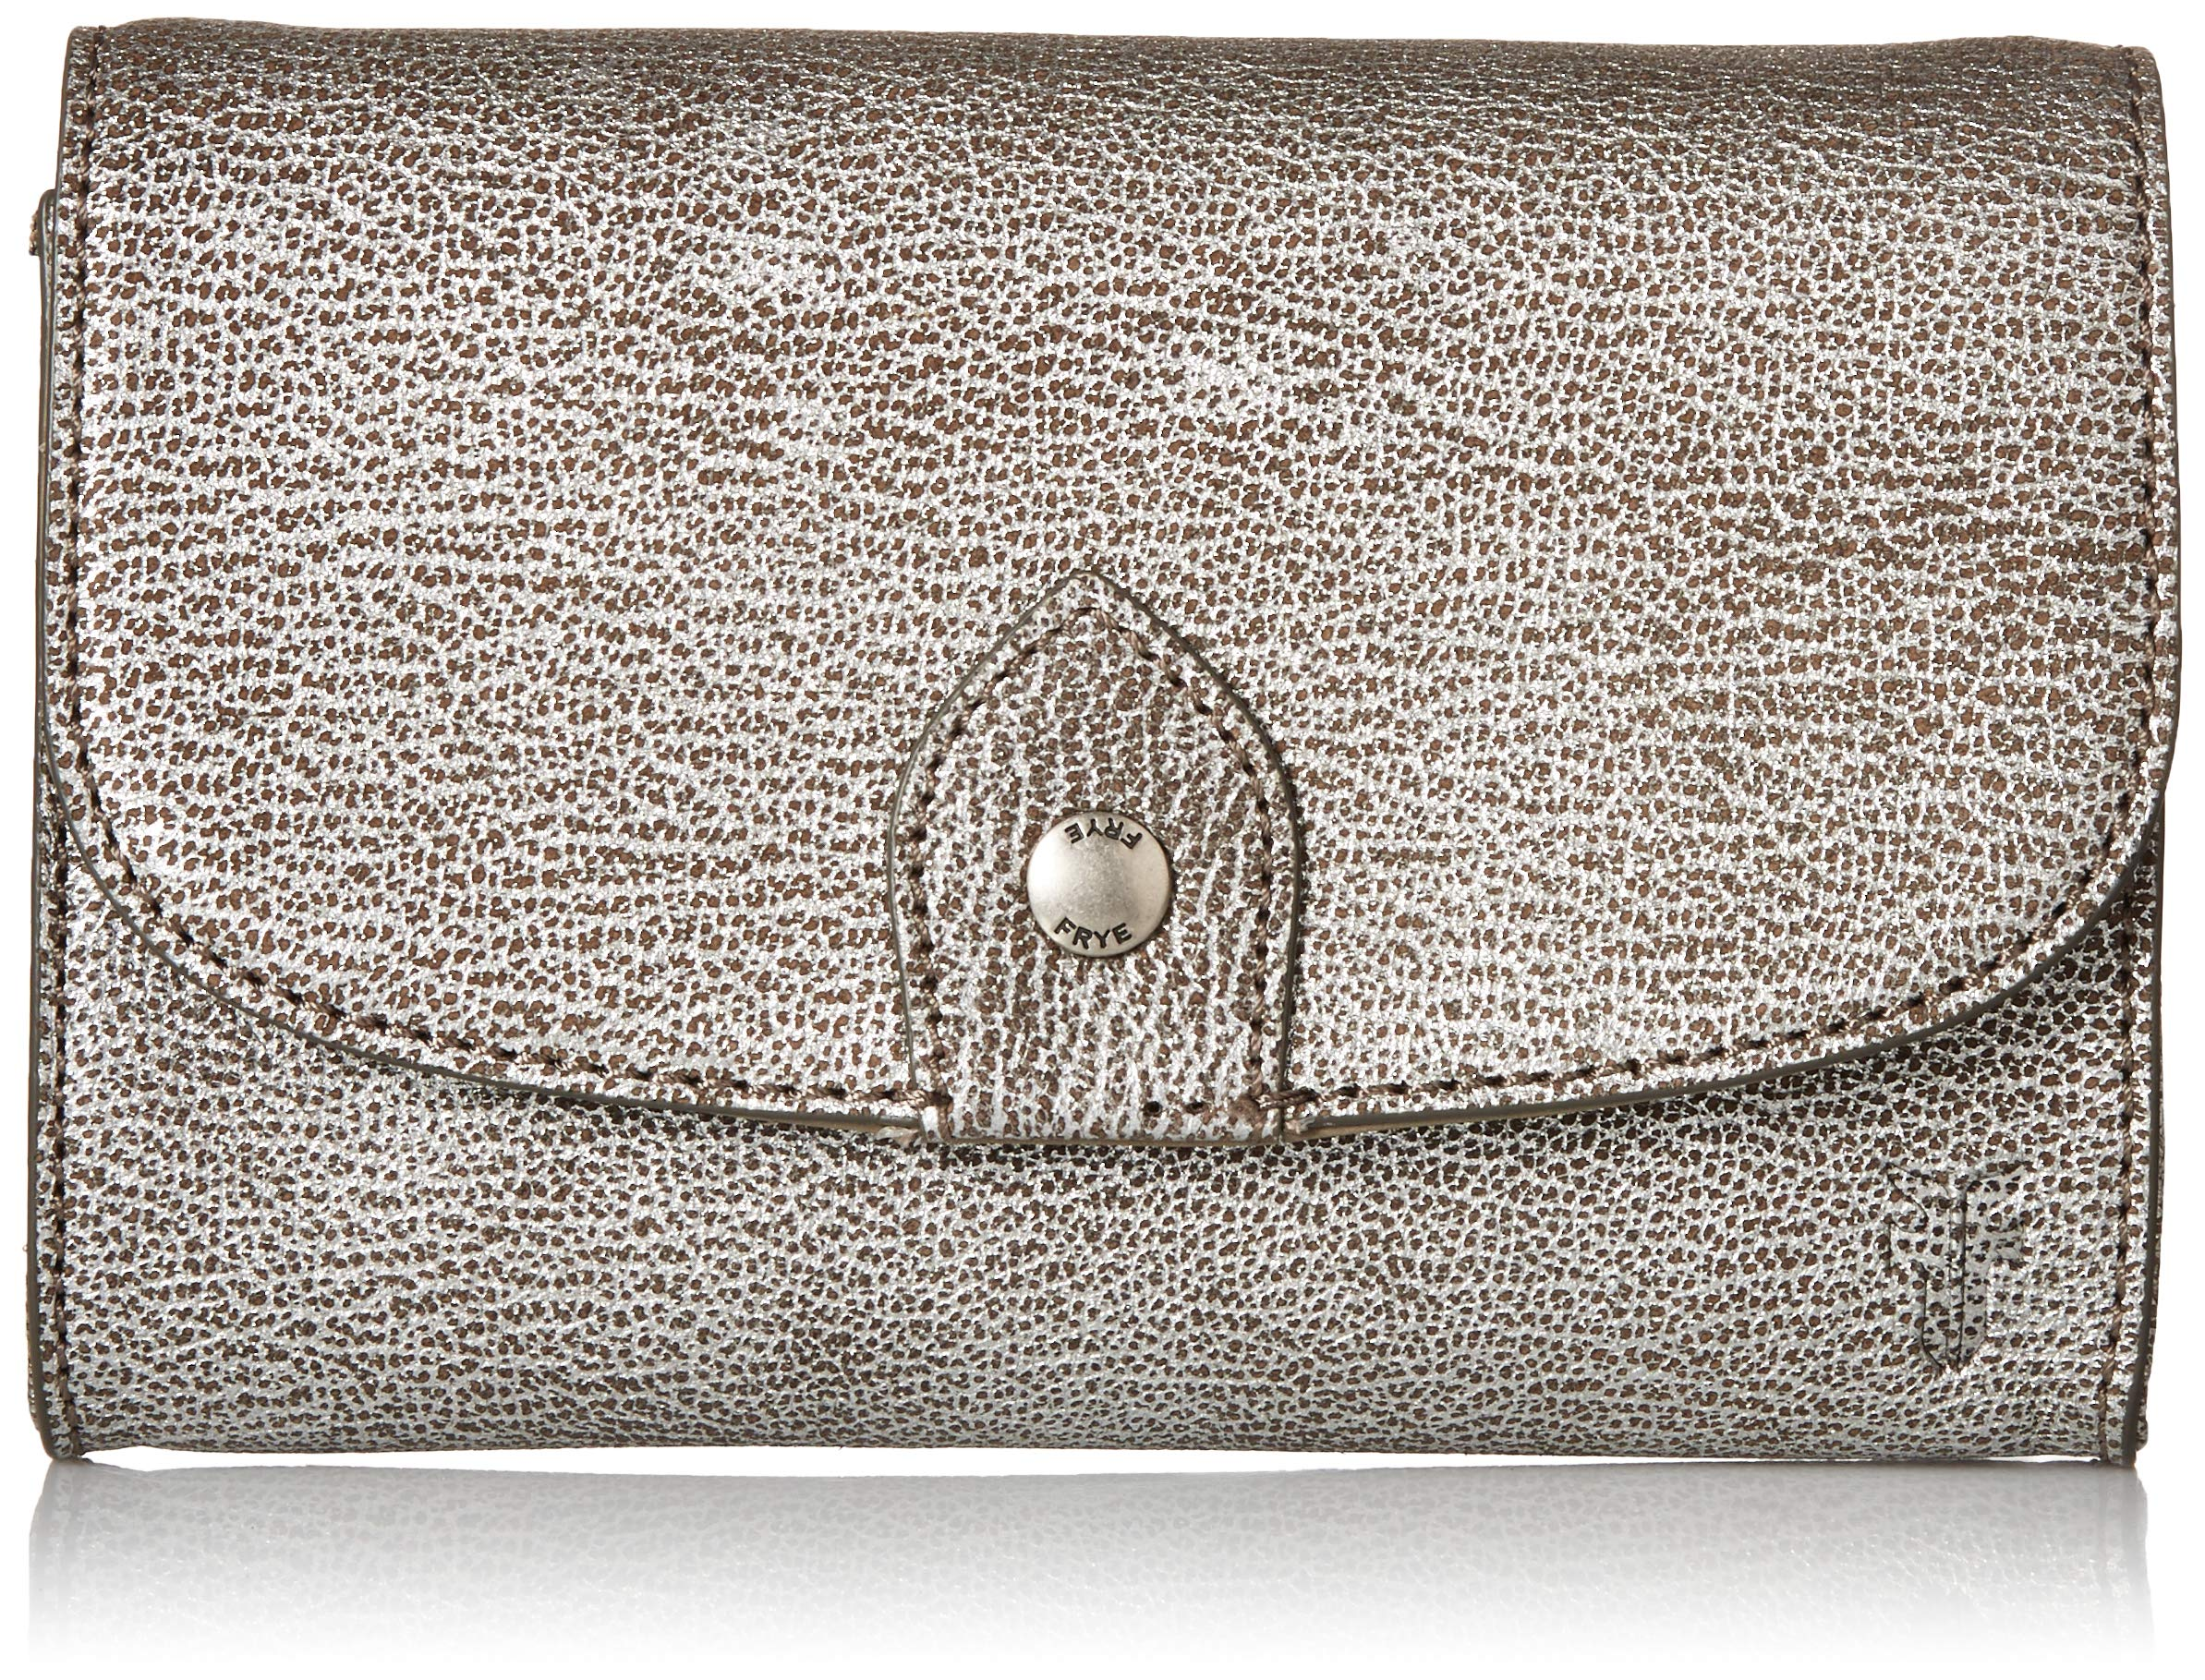 FRYE Melissa Wallet Crossbody Clutch Leather Bag, silver by FRYE (Image #1)